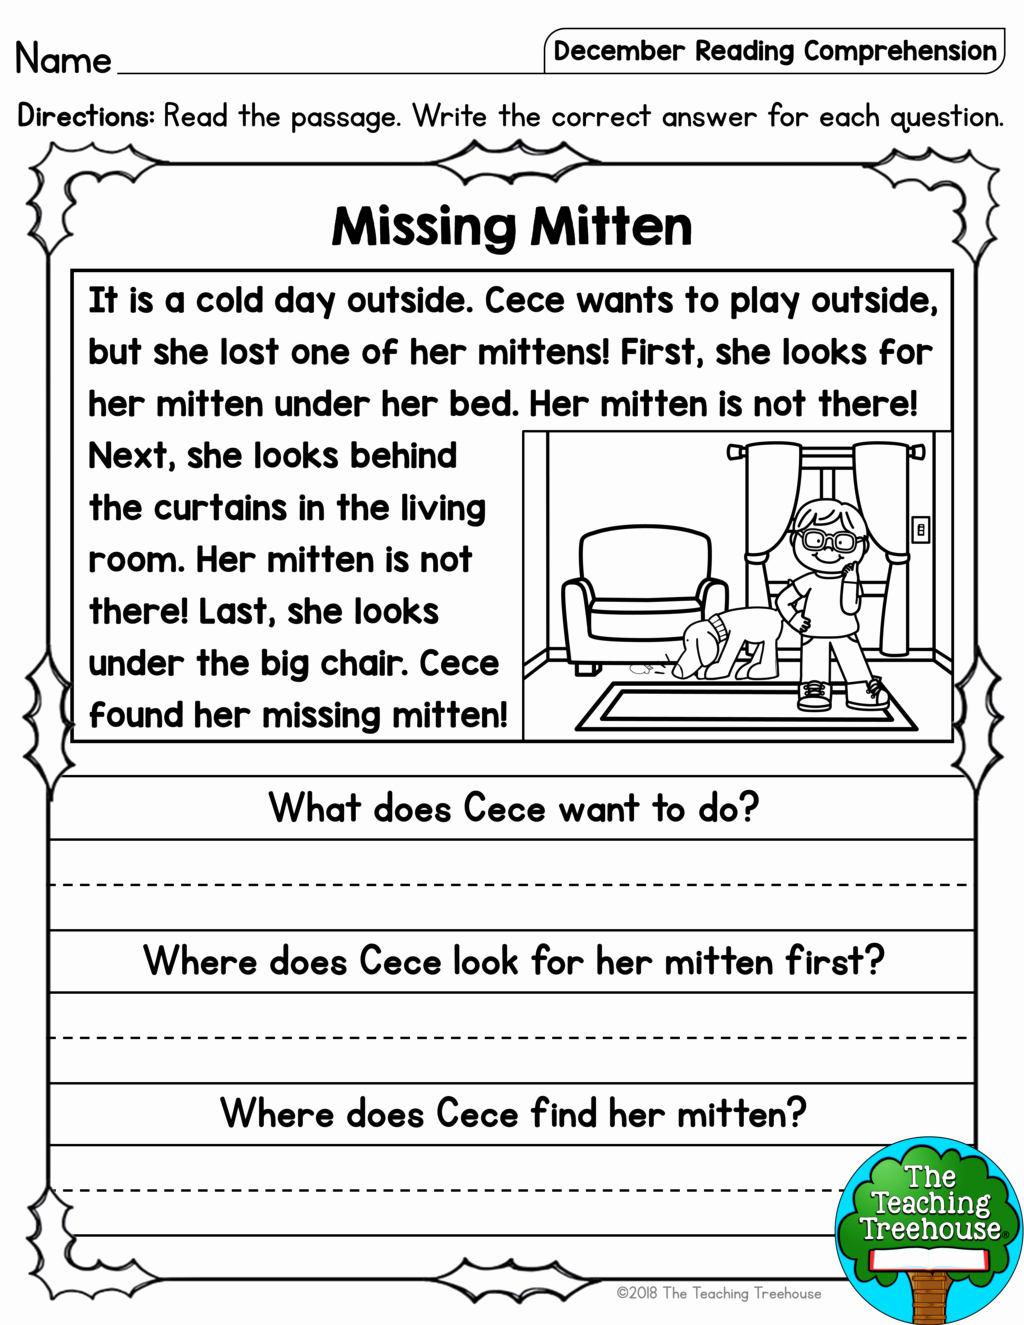 1st Grade Reading Worksheets Pdf Best Of 1st Grade Reading Prehension Worksheets Multiple Choice